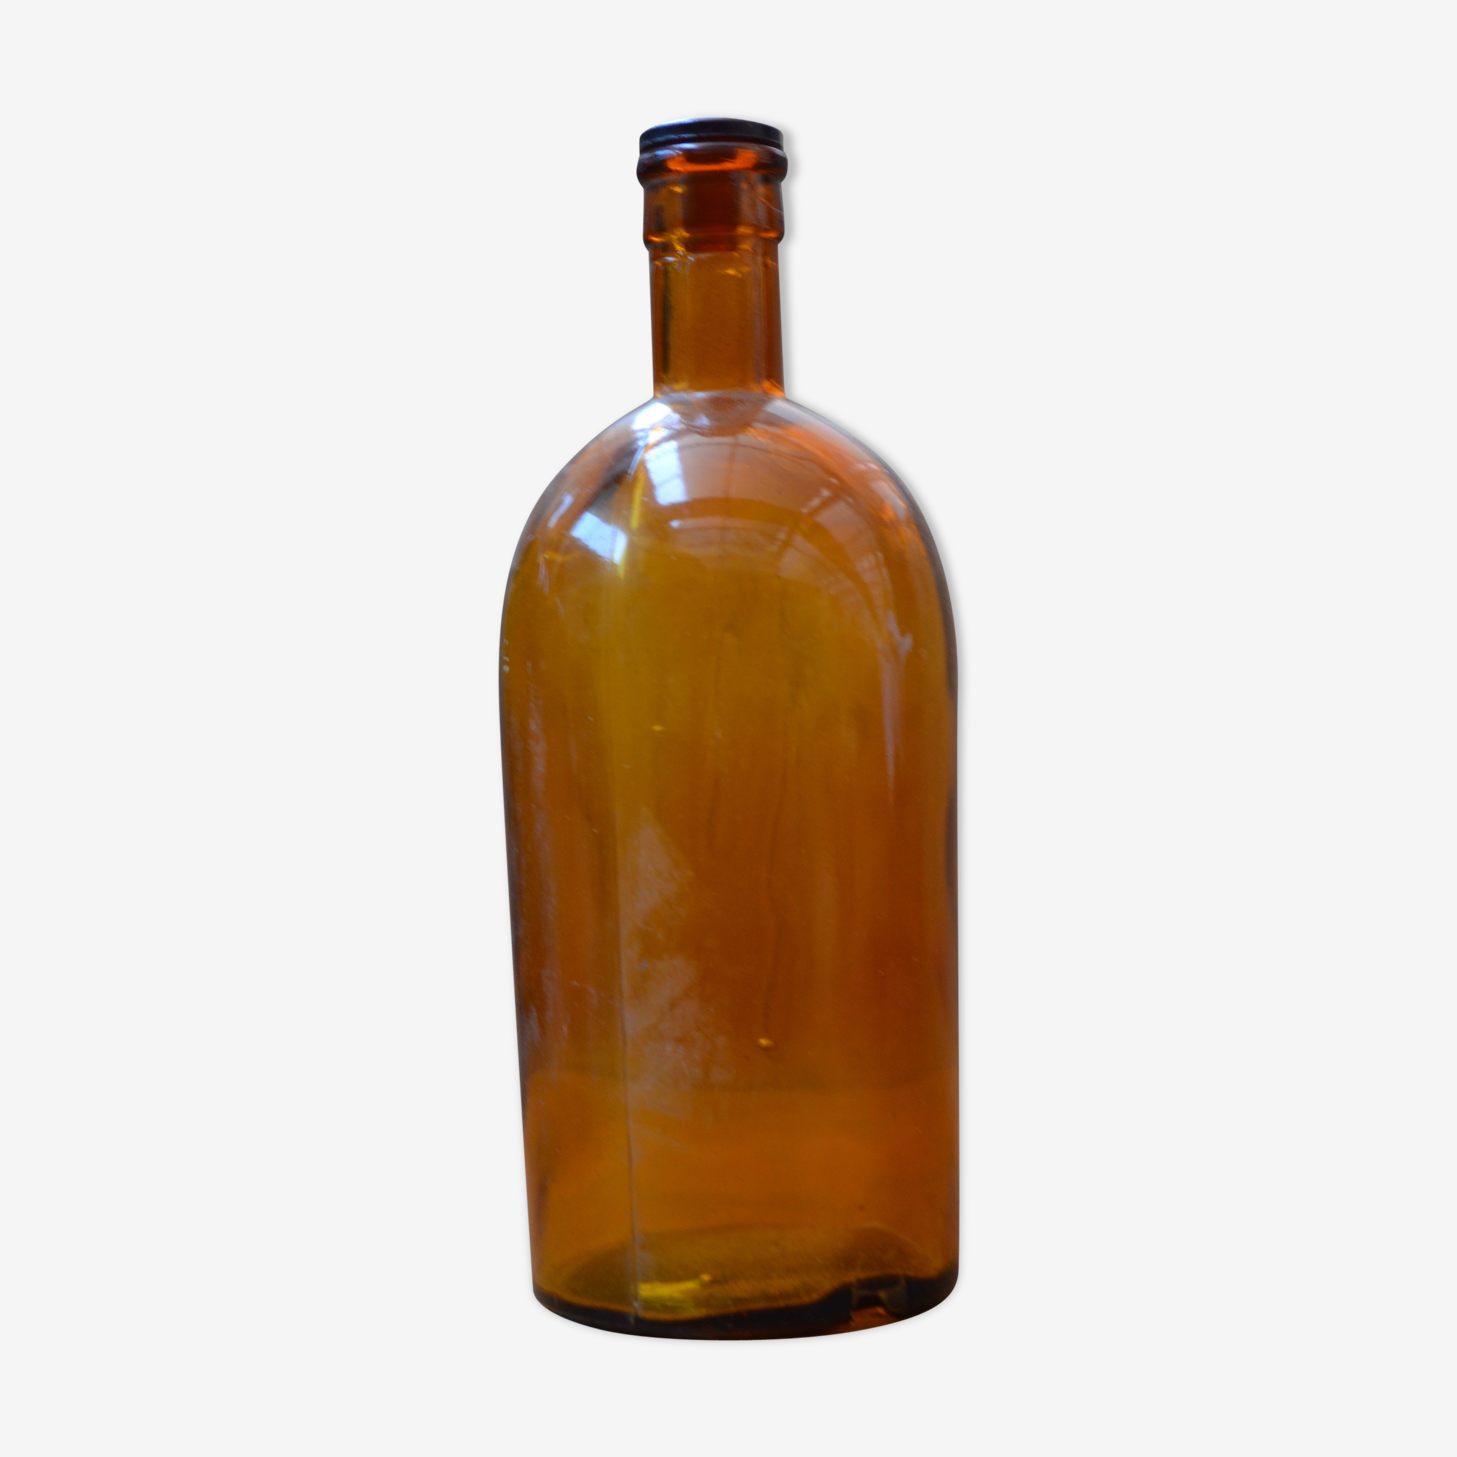 With Cap glass apothecary jar